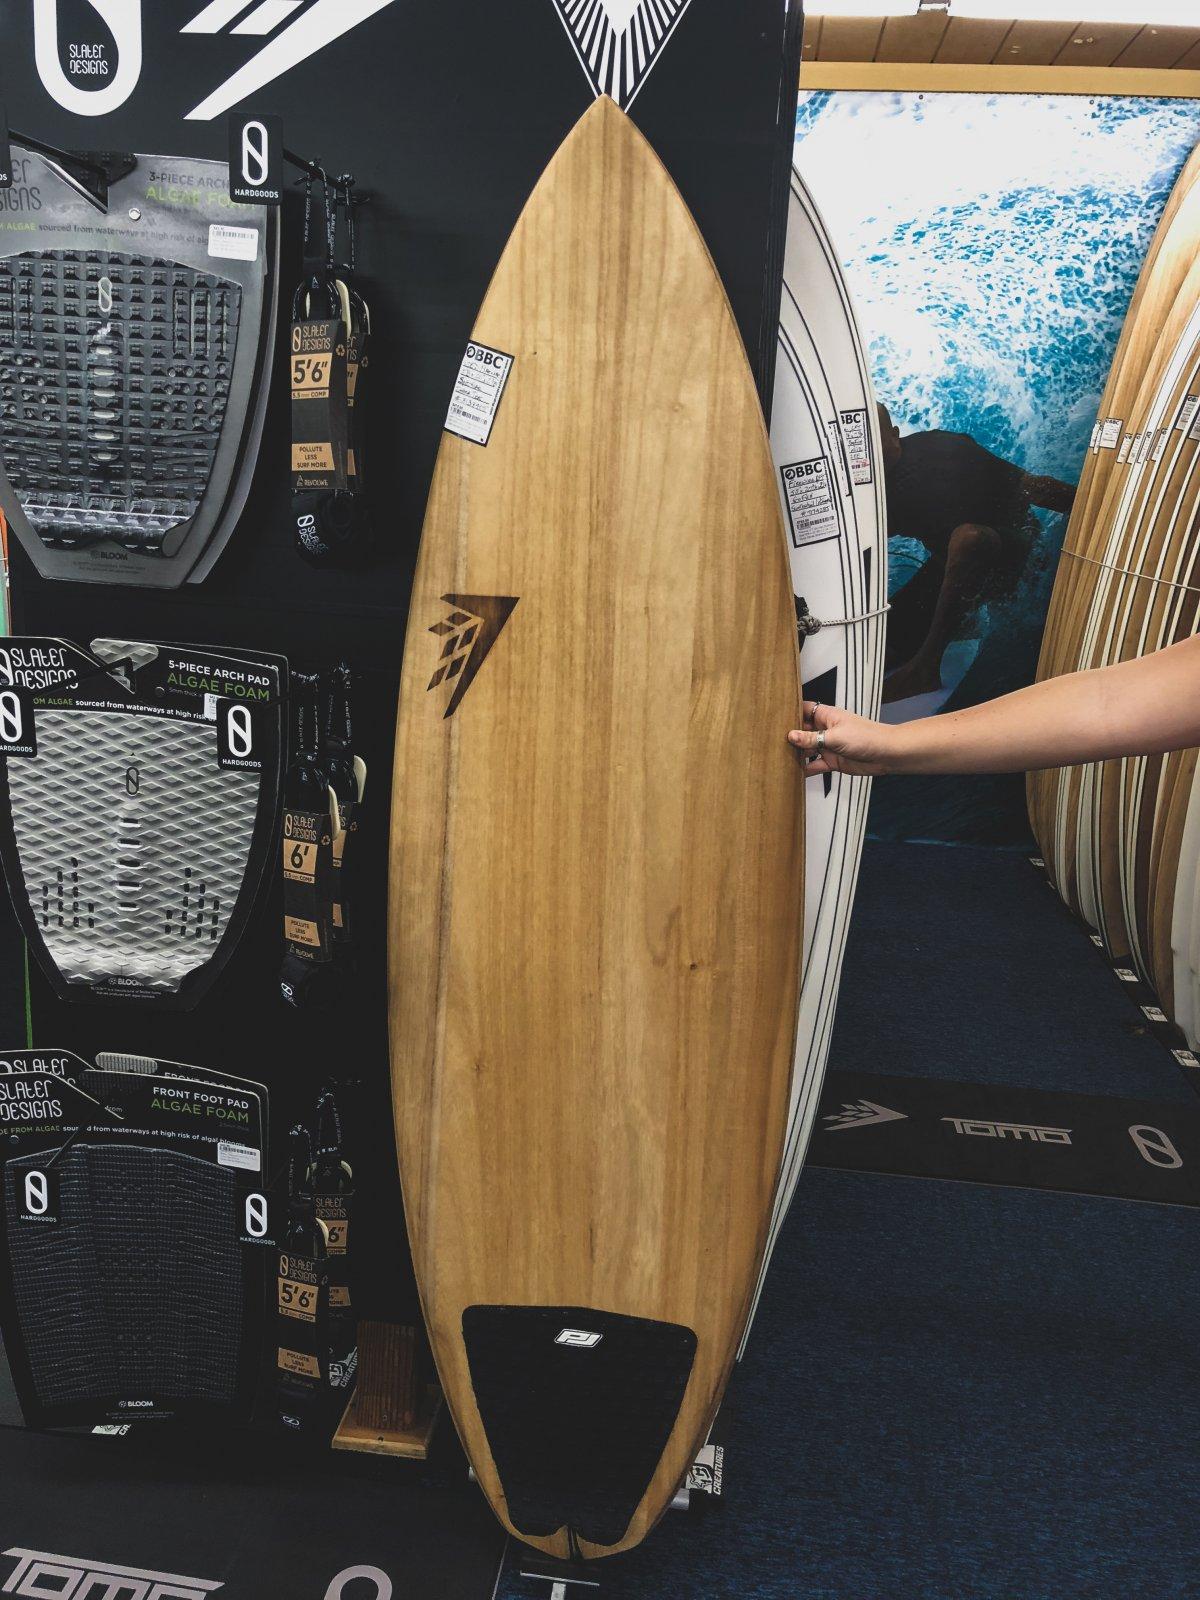 Used Firewire Timber Tek Spitfire Surfboard